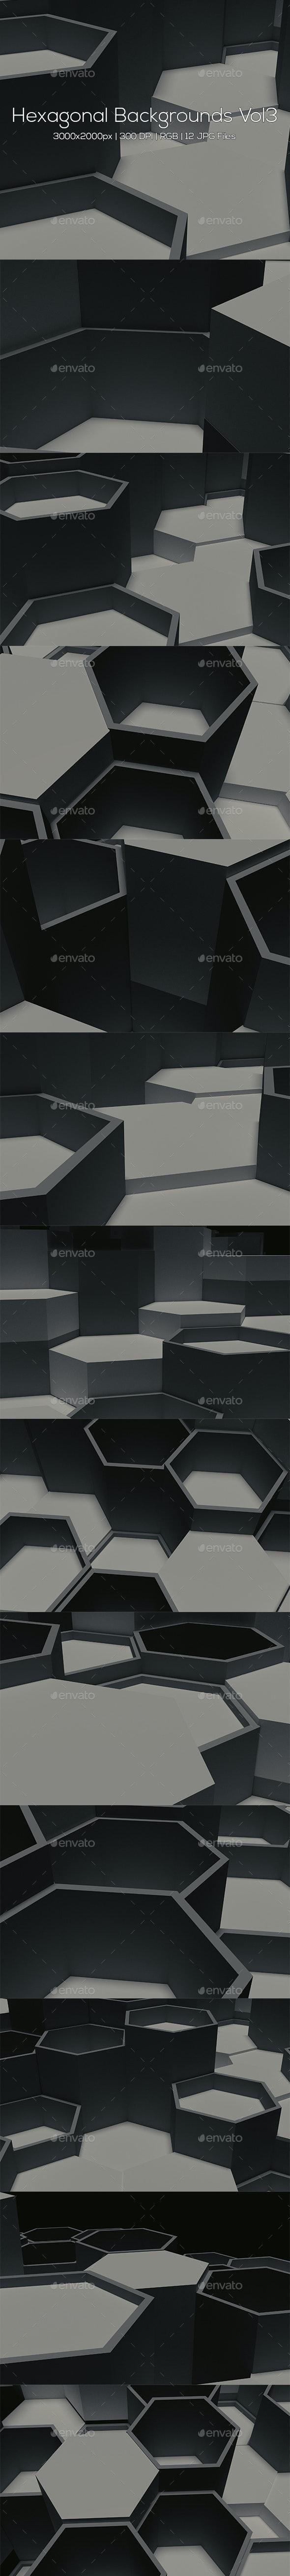 Hexagonal Backgrounds Vol3 - Abstract Backgrounds